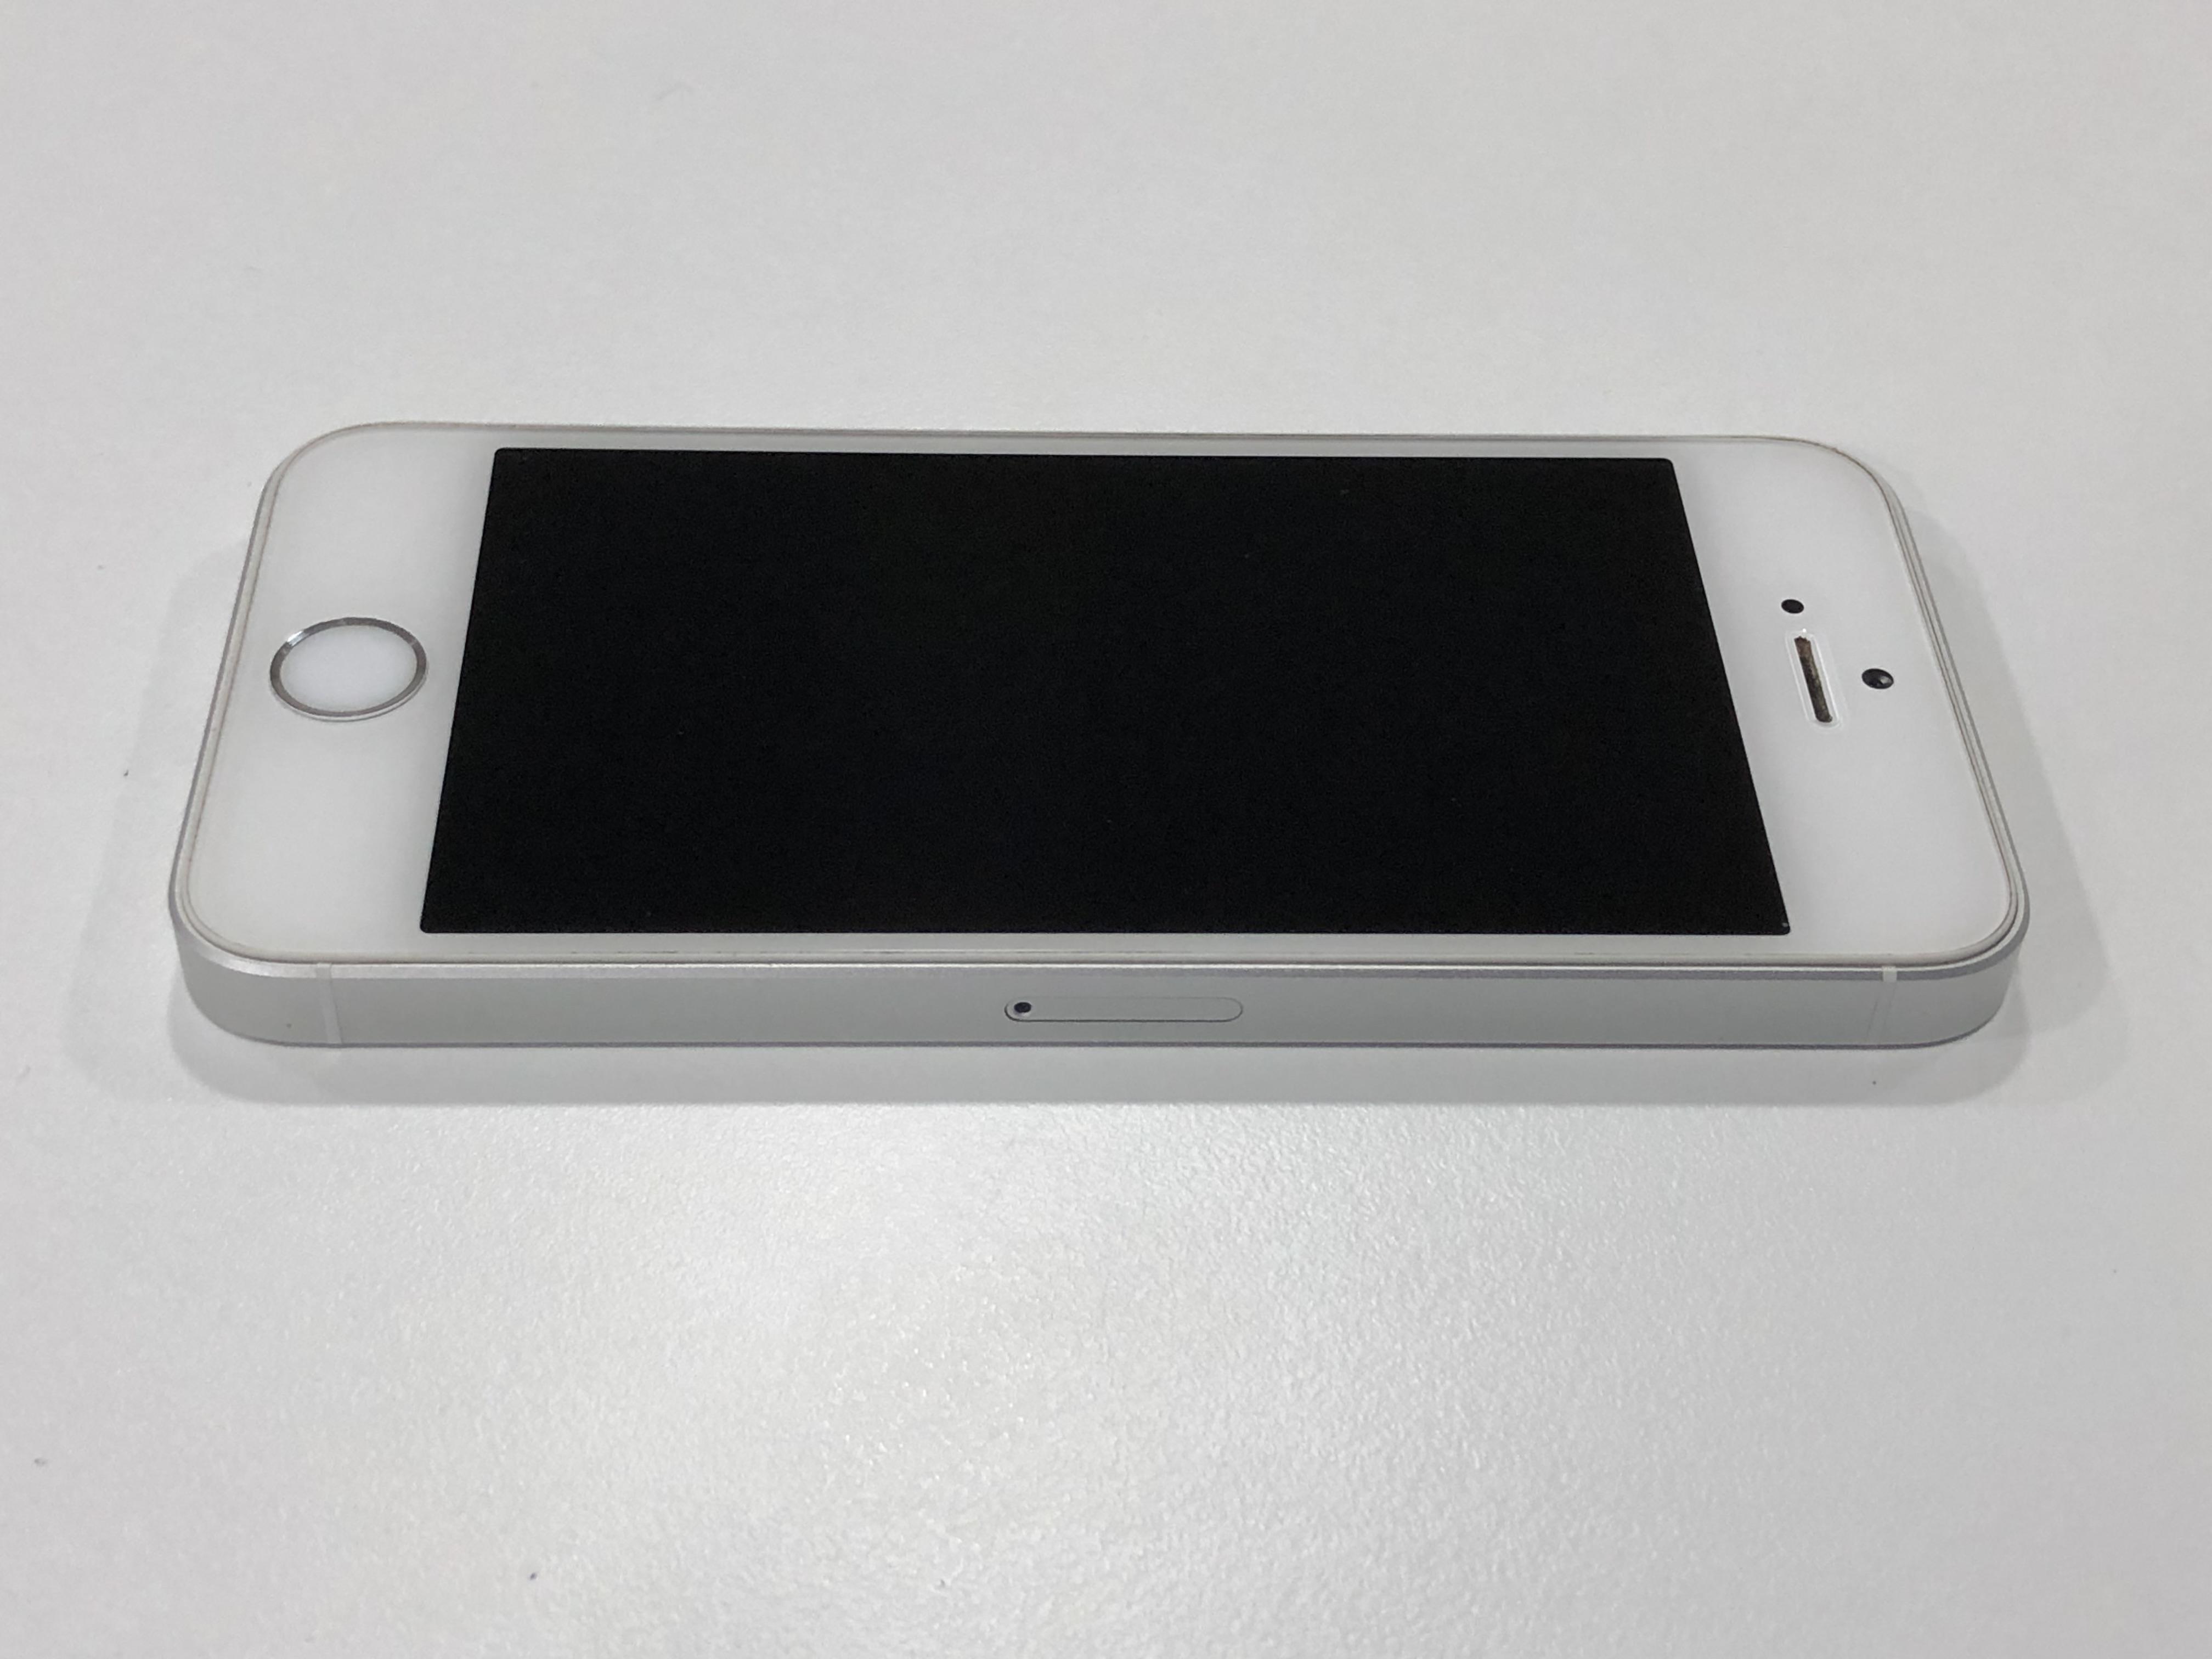 iPhone SE 16GB, 16 GB, SILVER, imagen 1